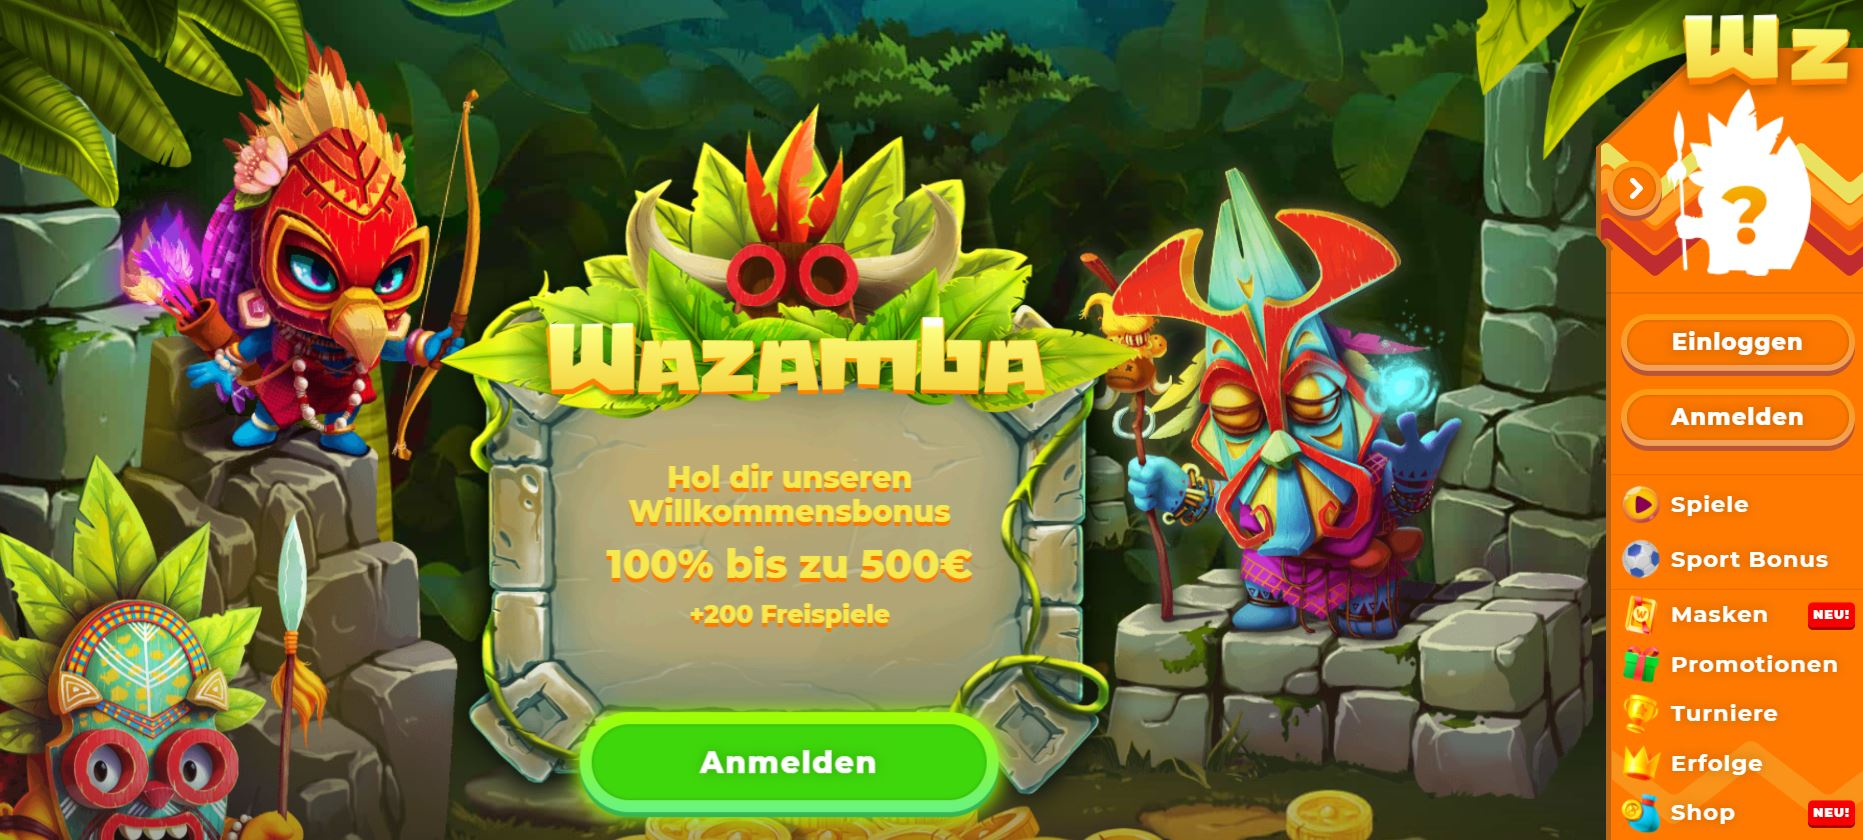 willkommen bei wazamba